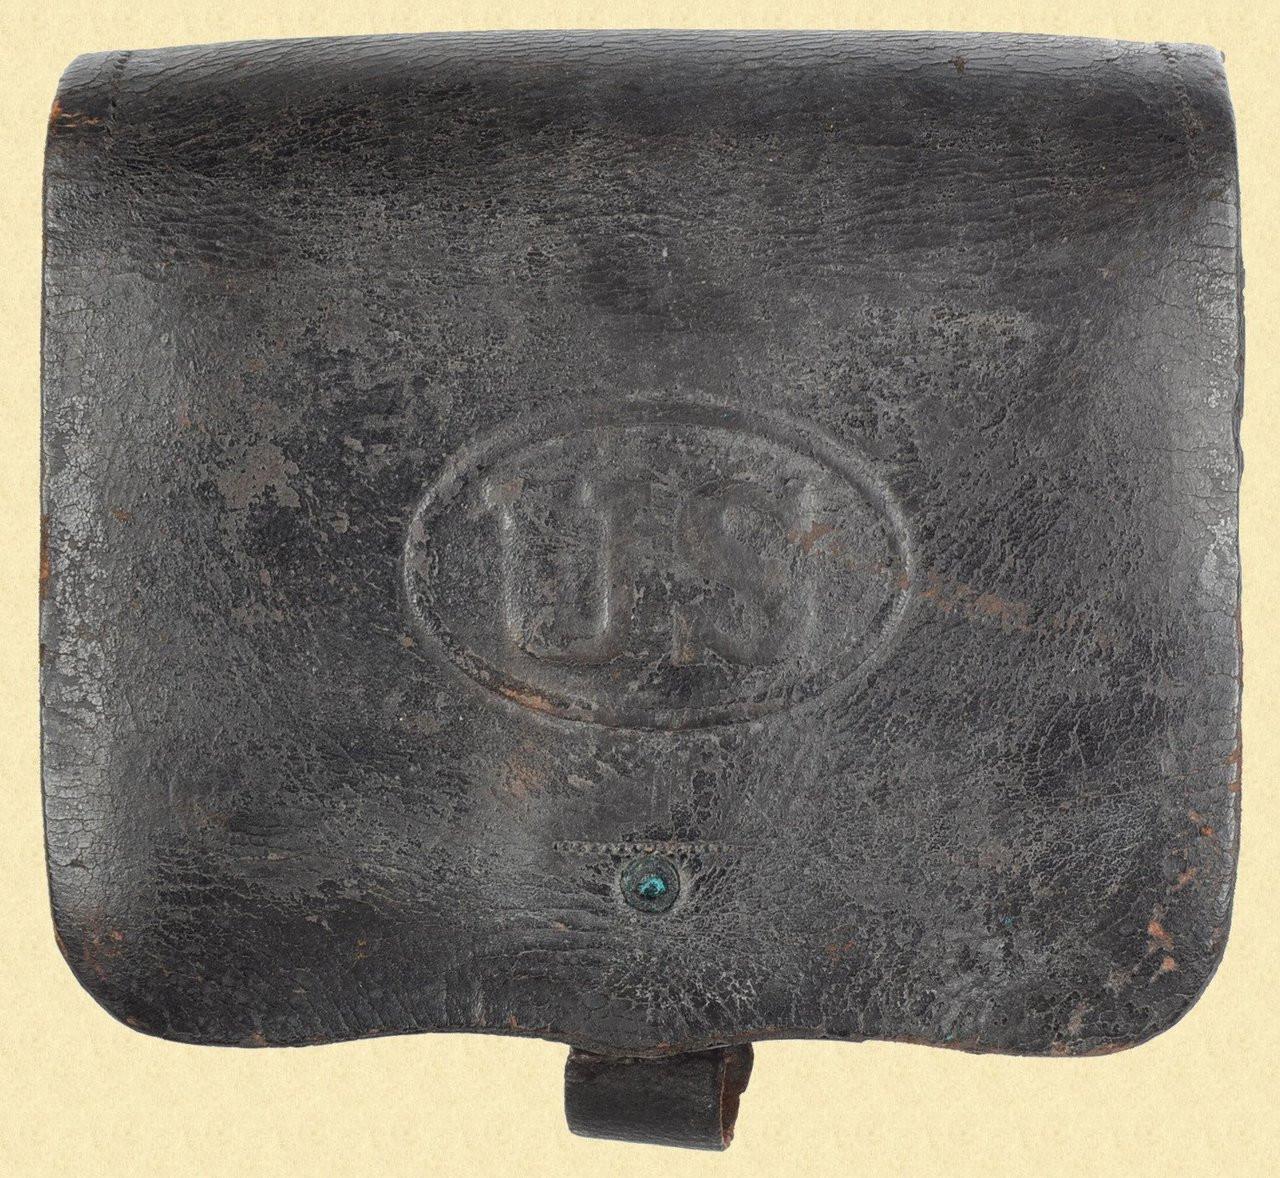 U.S. M1864 CARTRIDGE BOX - C26923